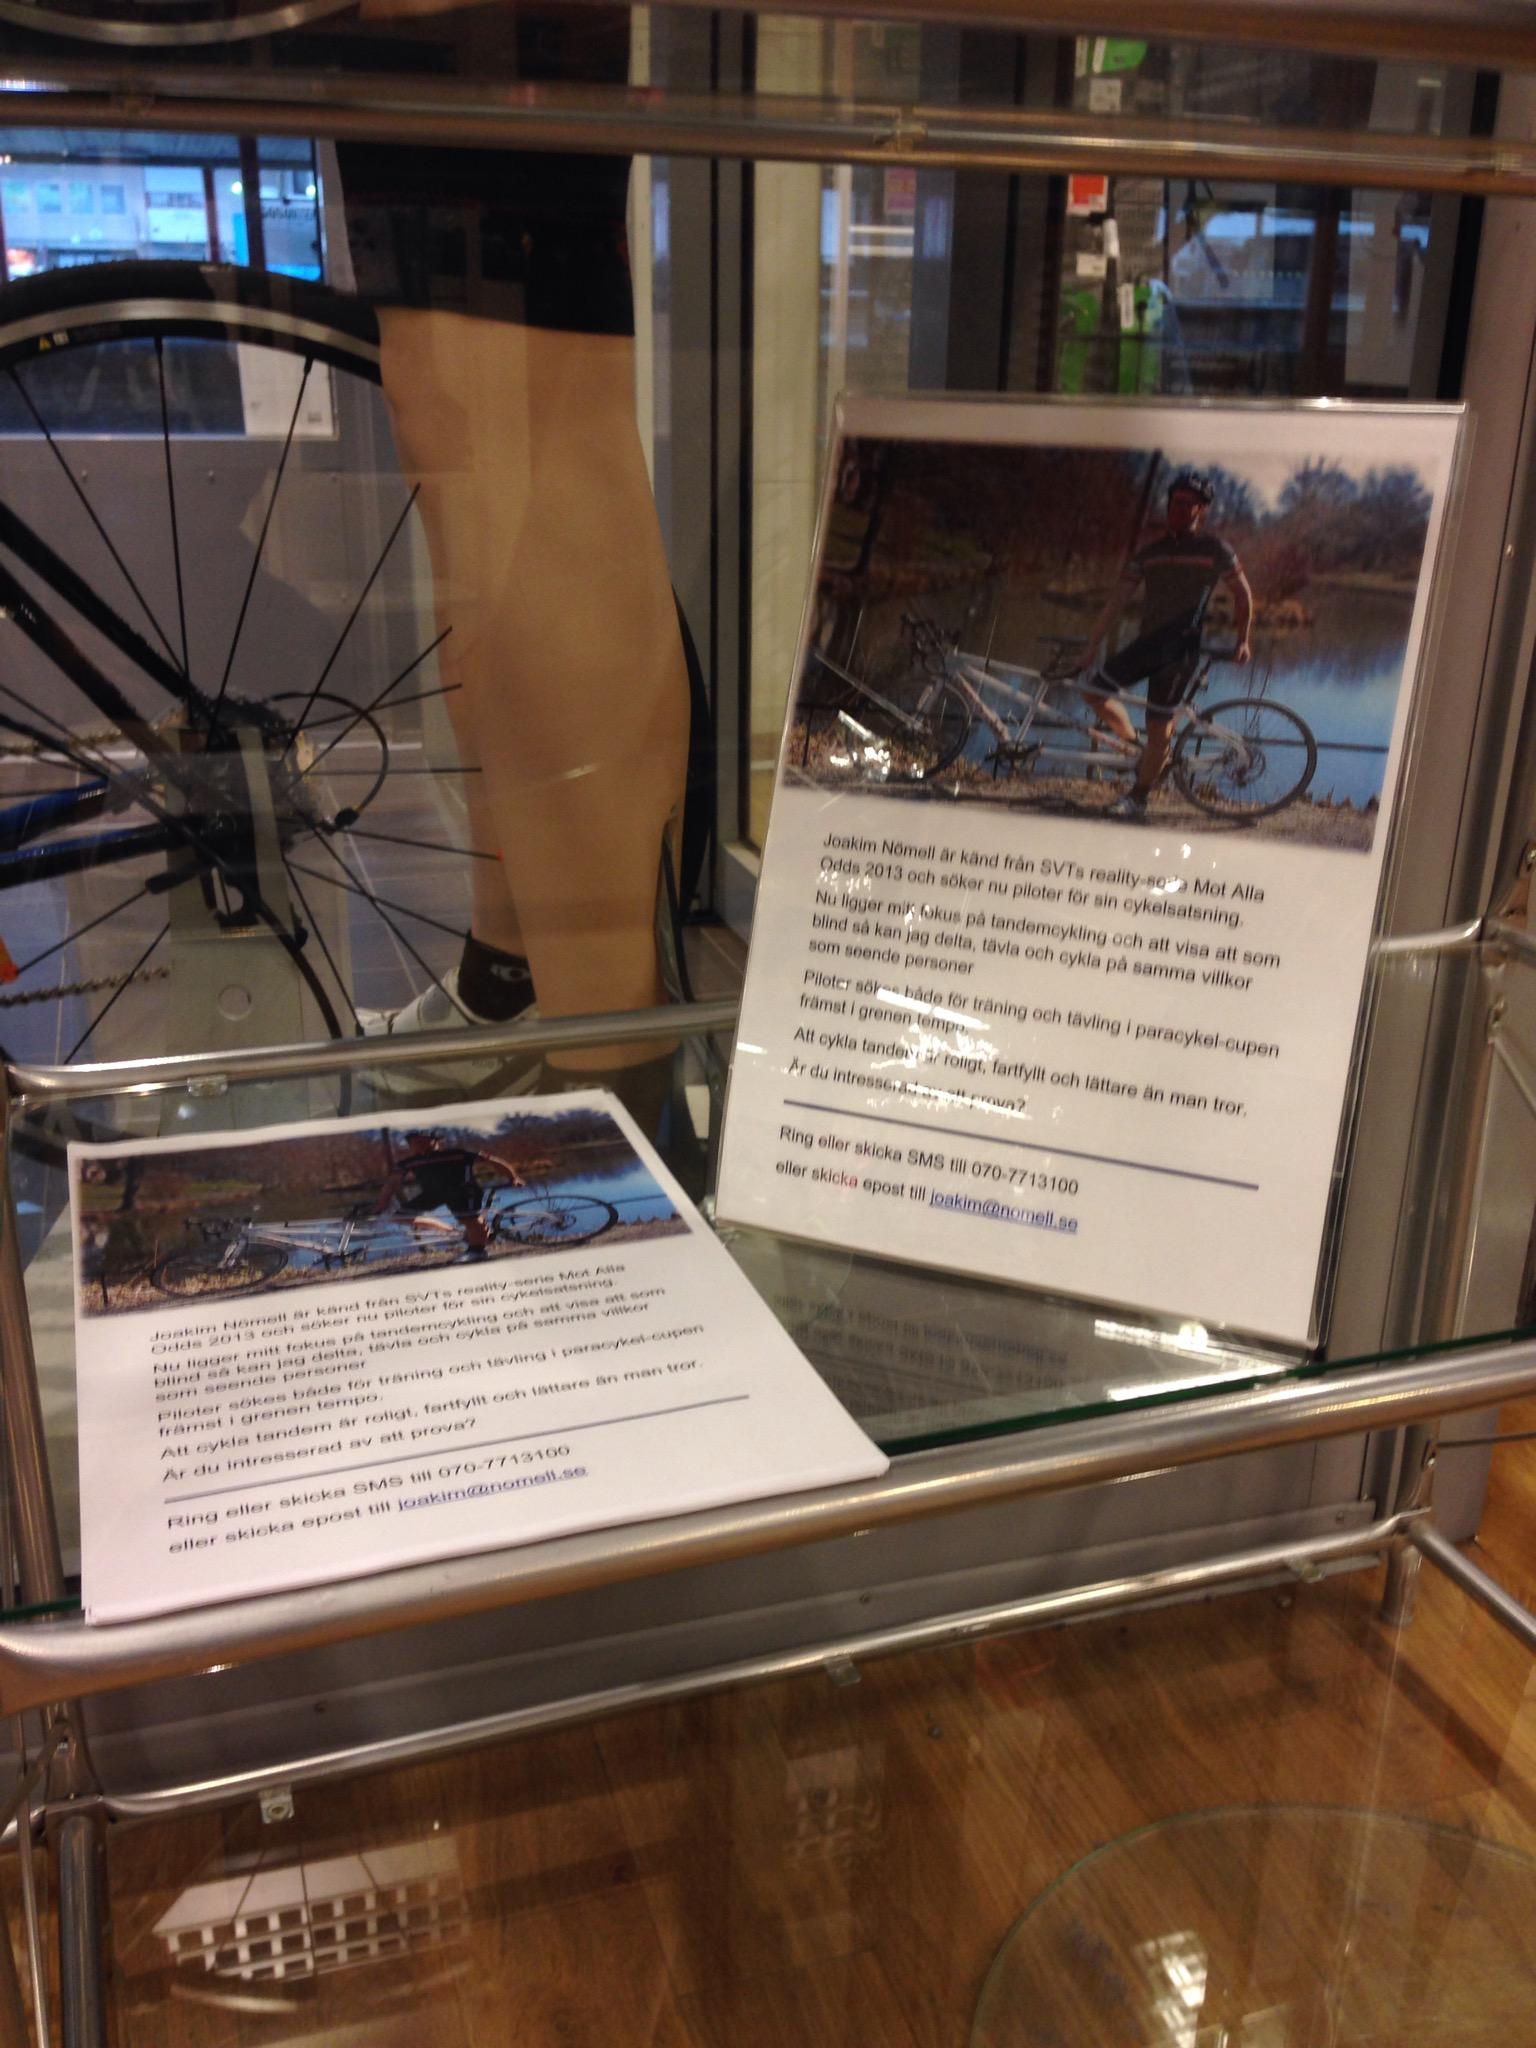 Bild: Anslag i cykelbutik